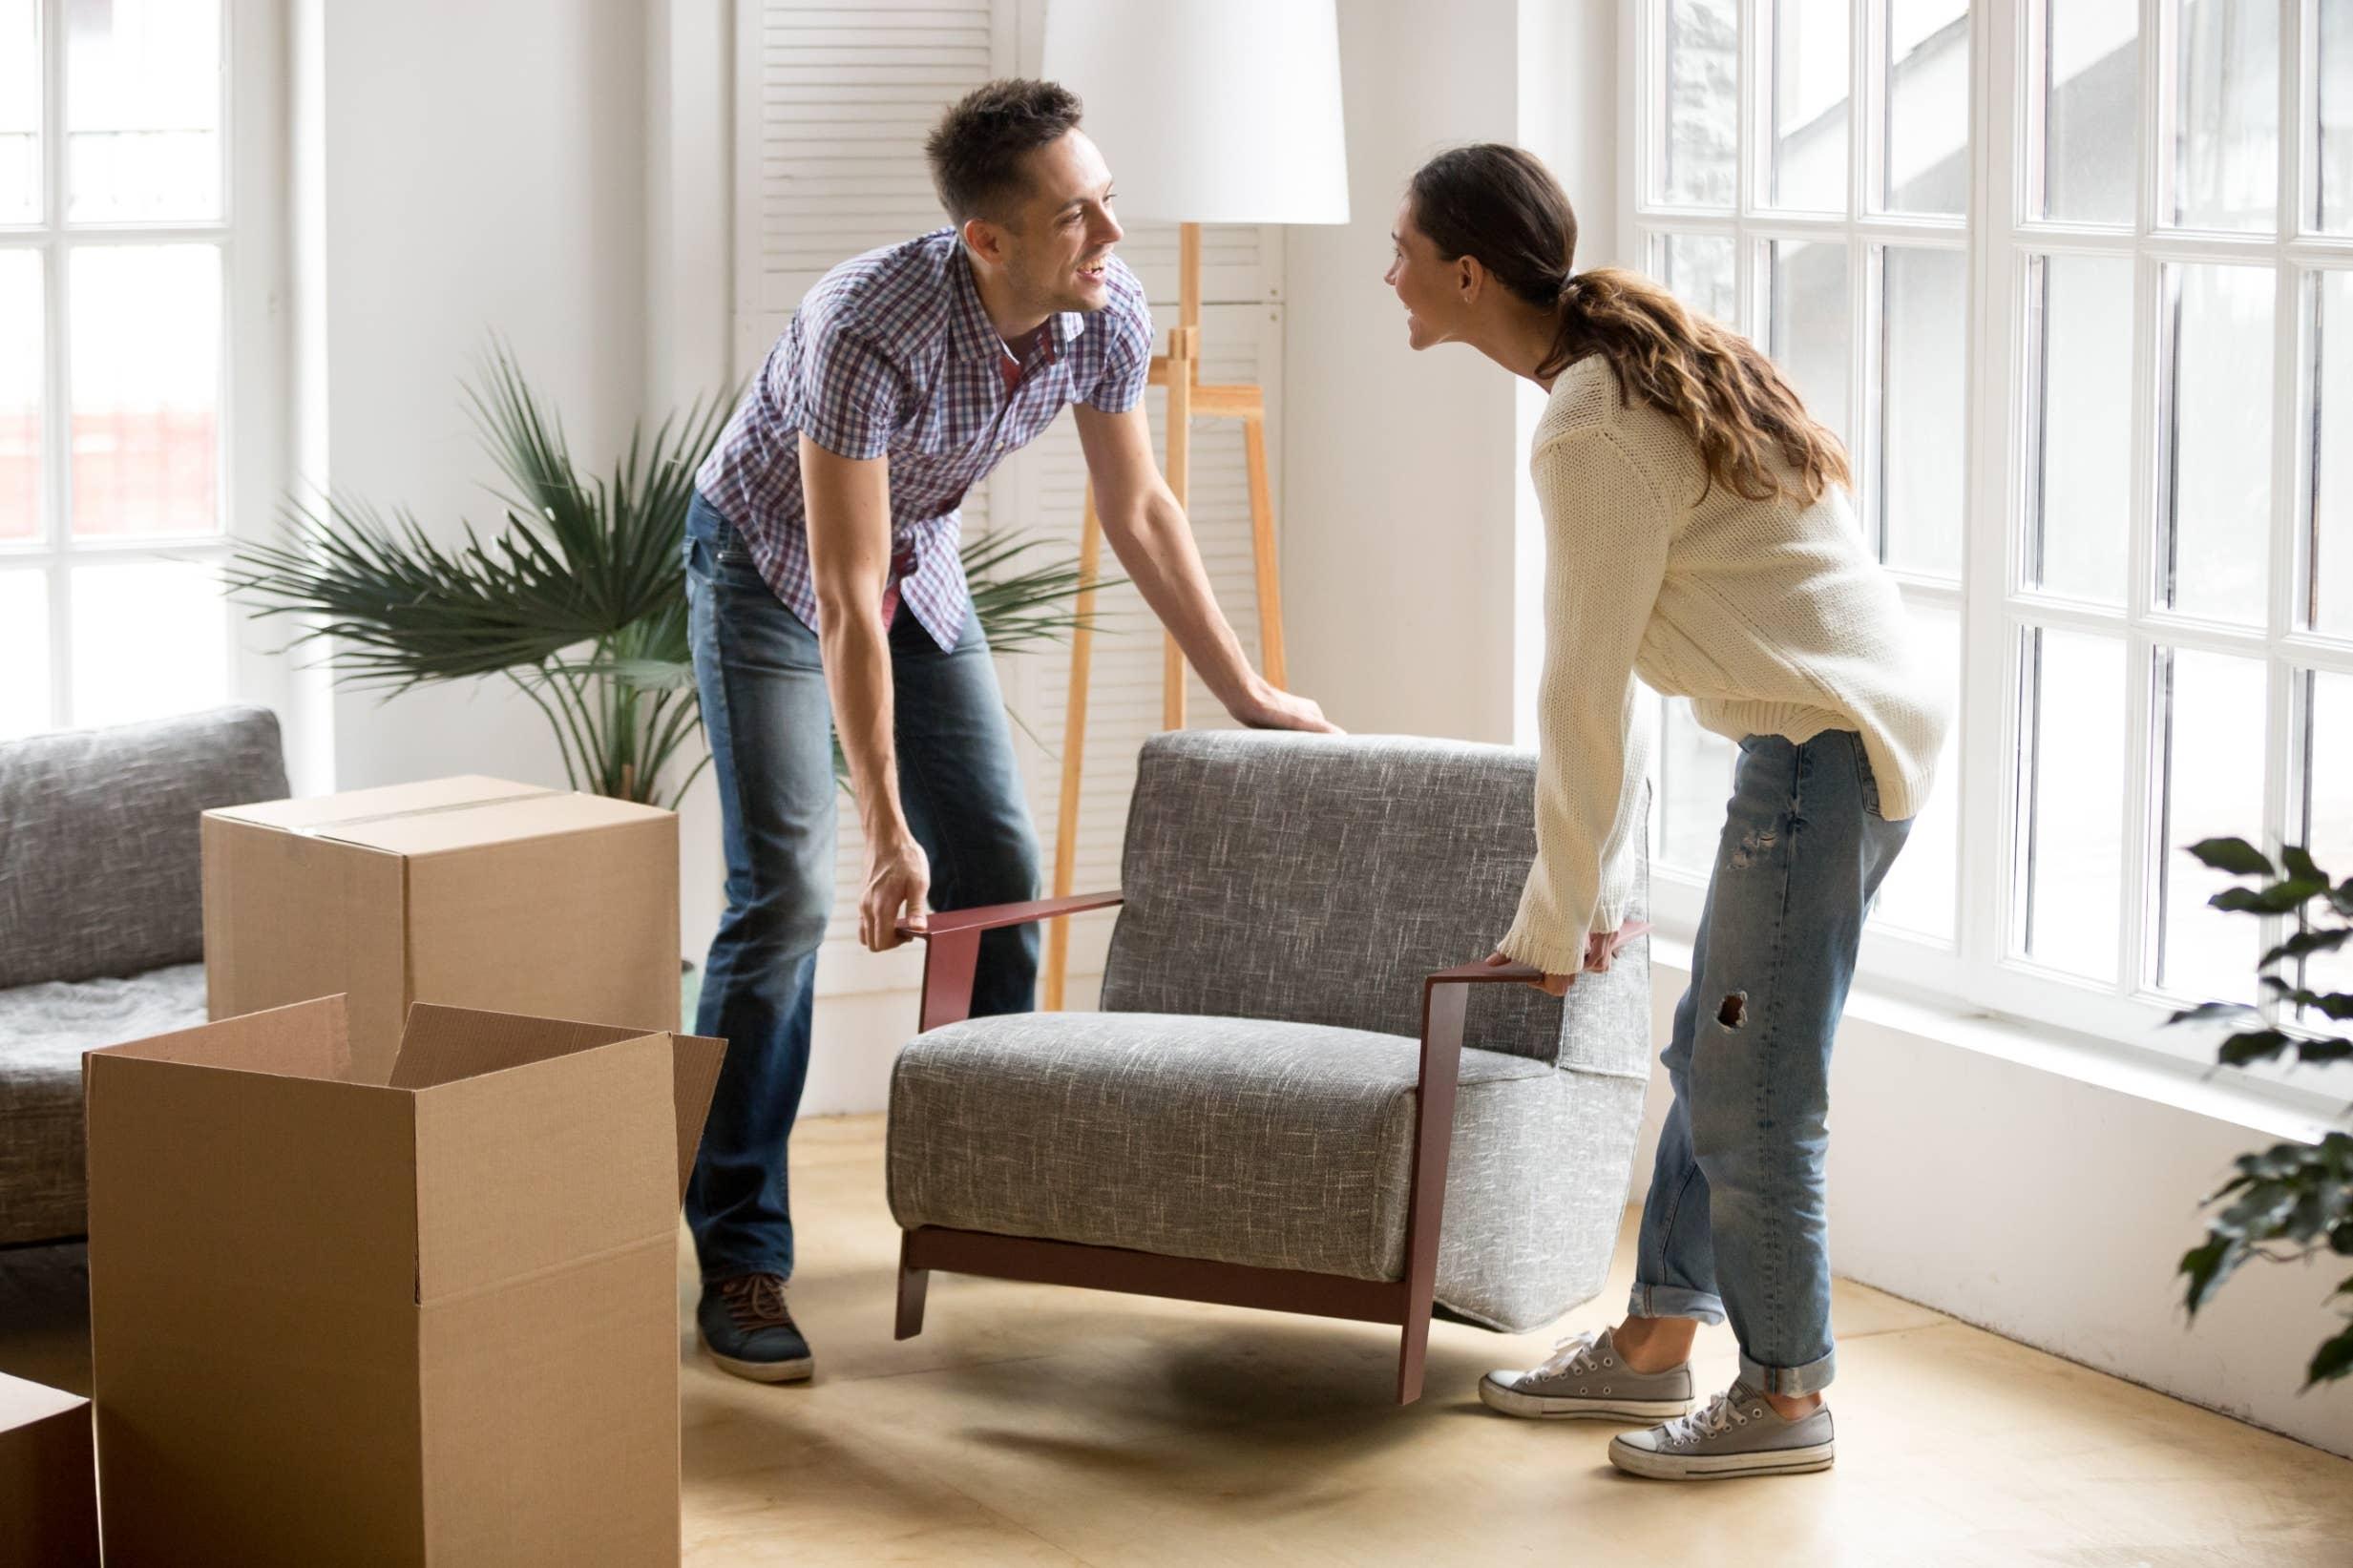 pareja mudándose a casa nueva